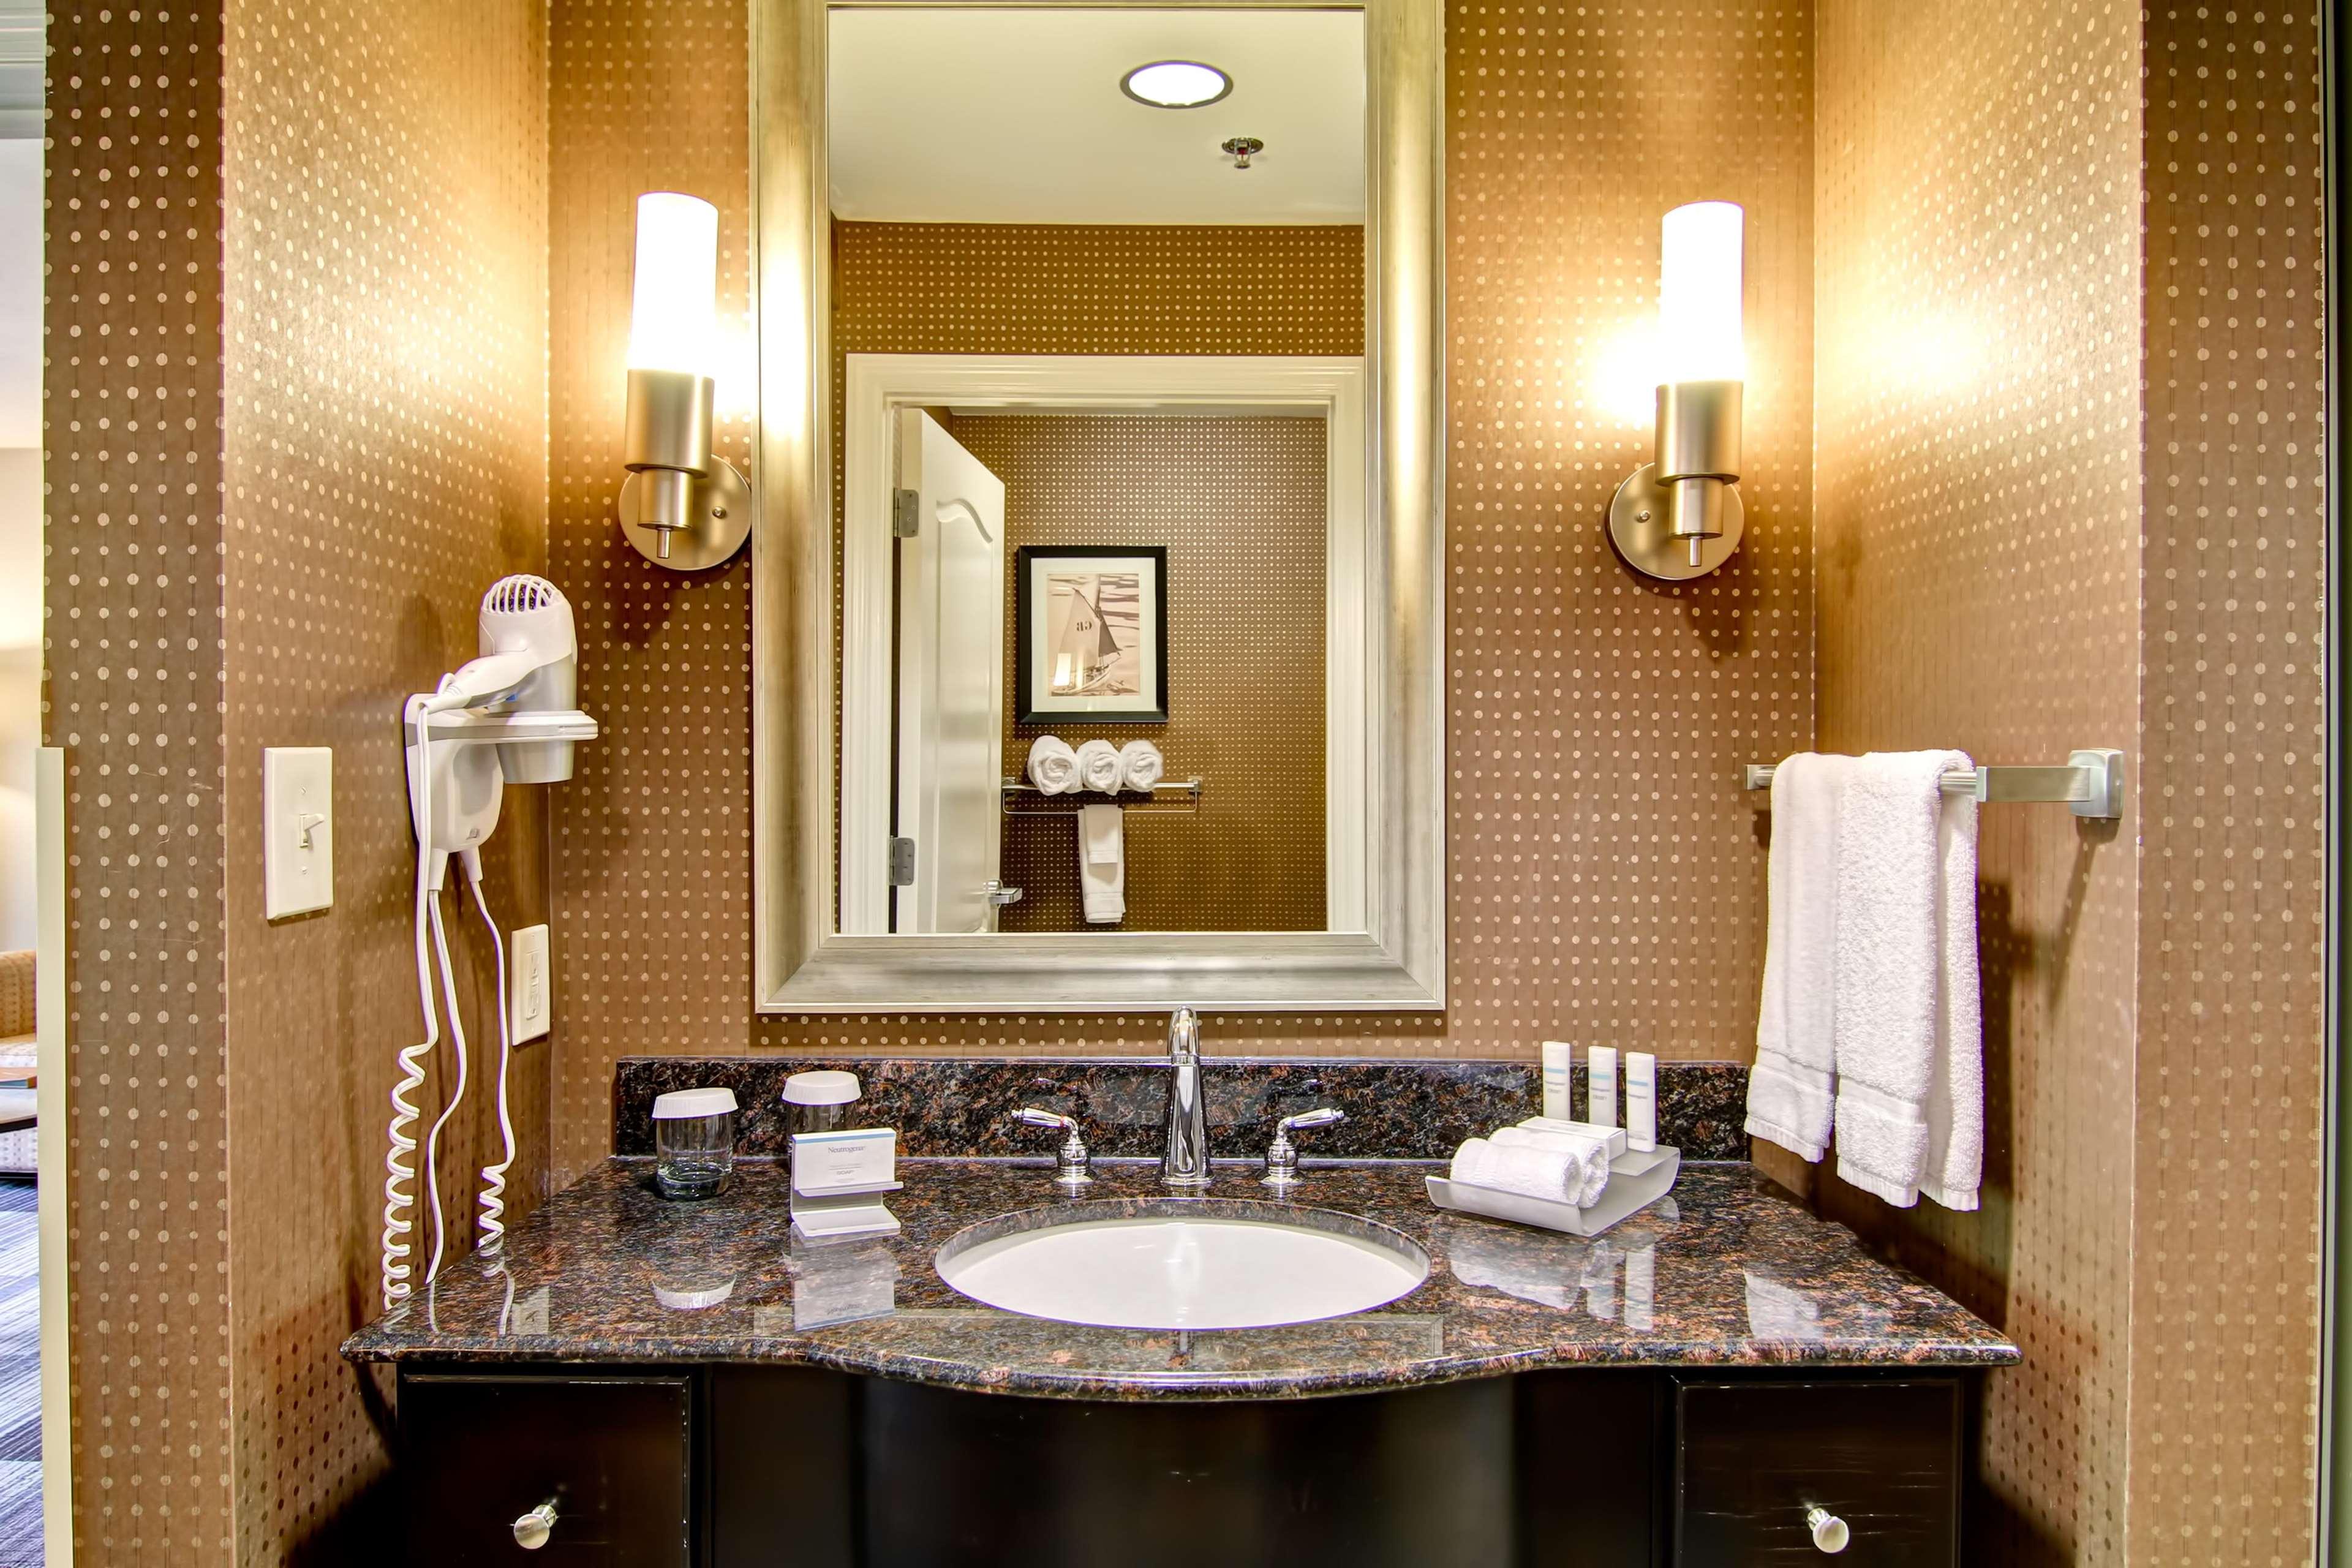 Homewood Suites by Hilton Cincinnati Airport South-Florence image 35